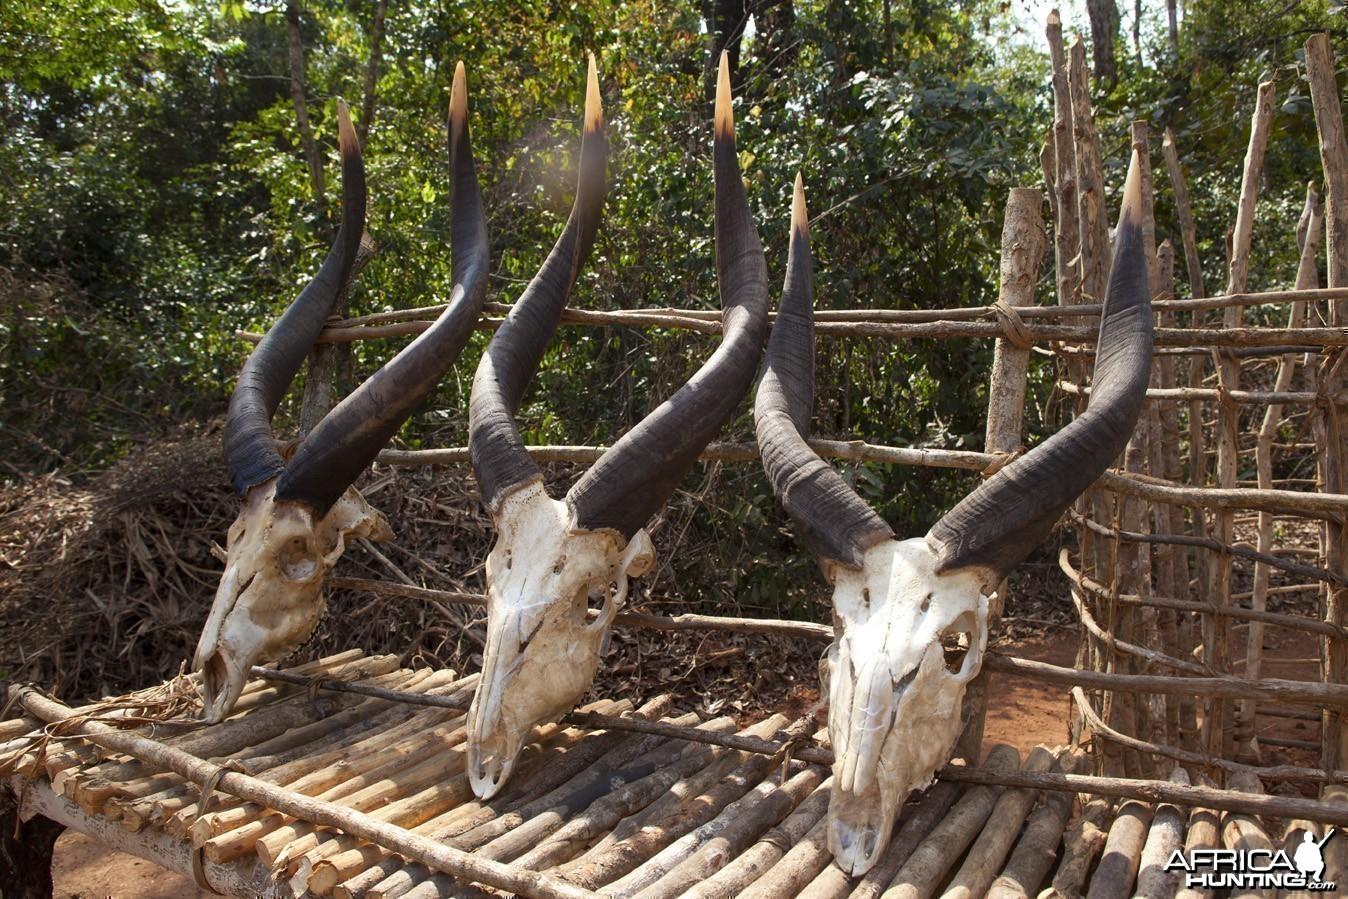 Three sets of Bongo horns